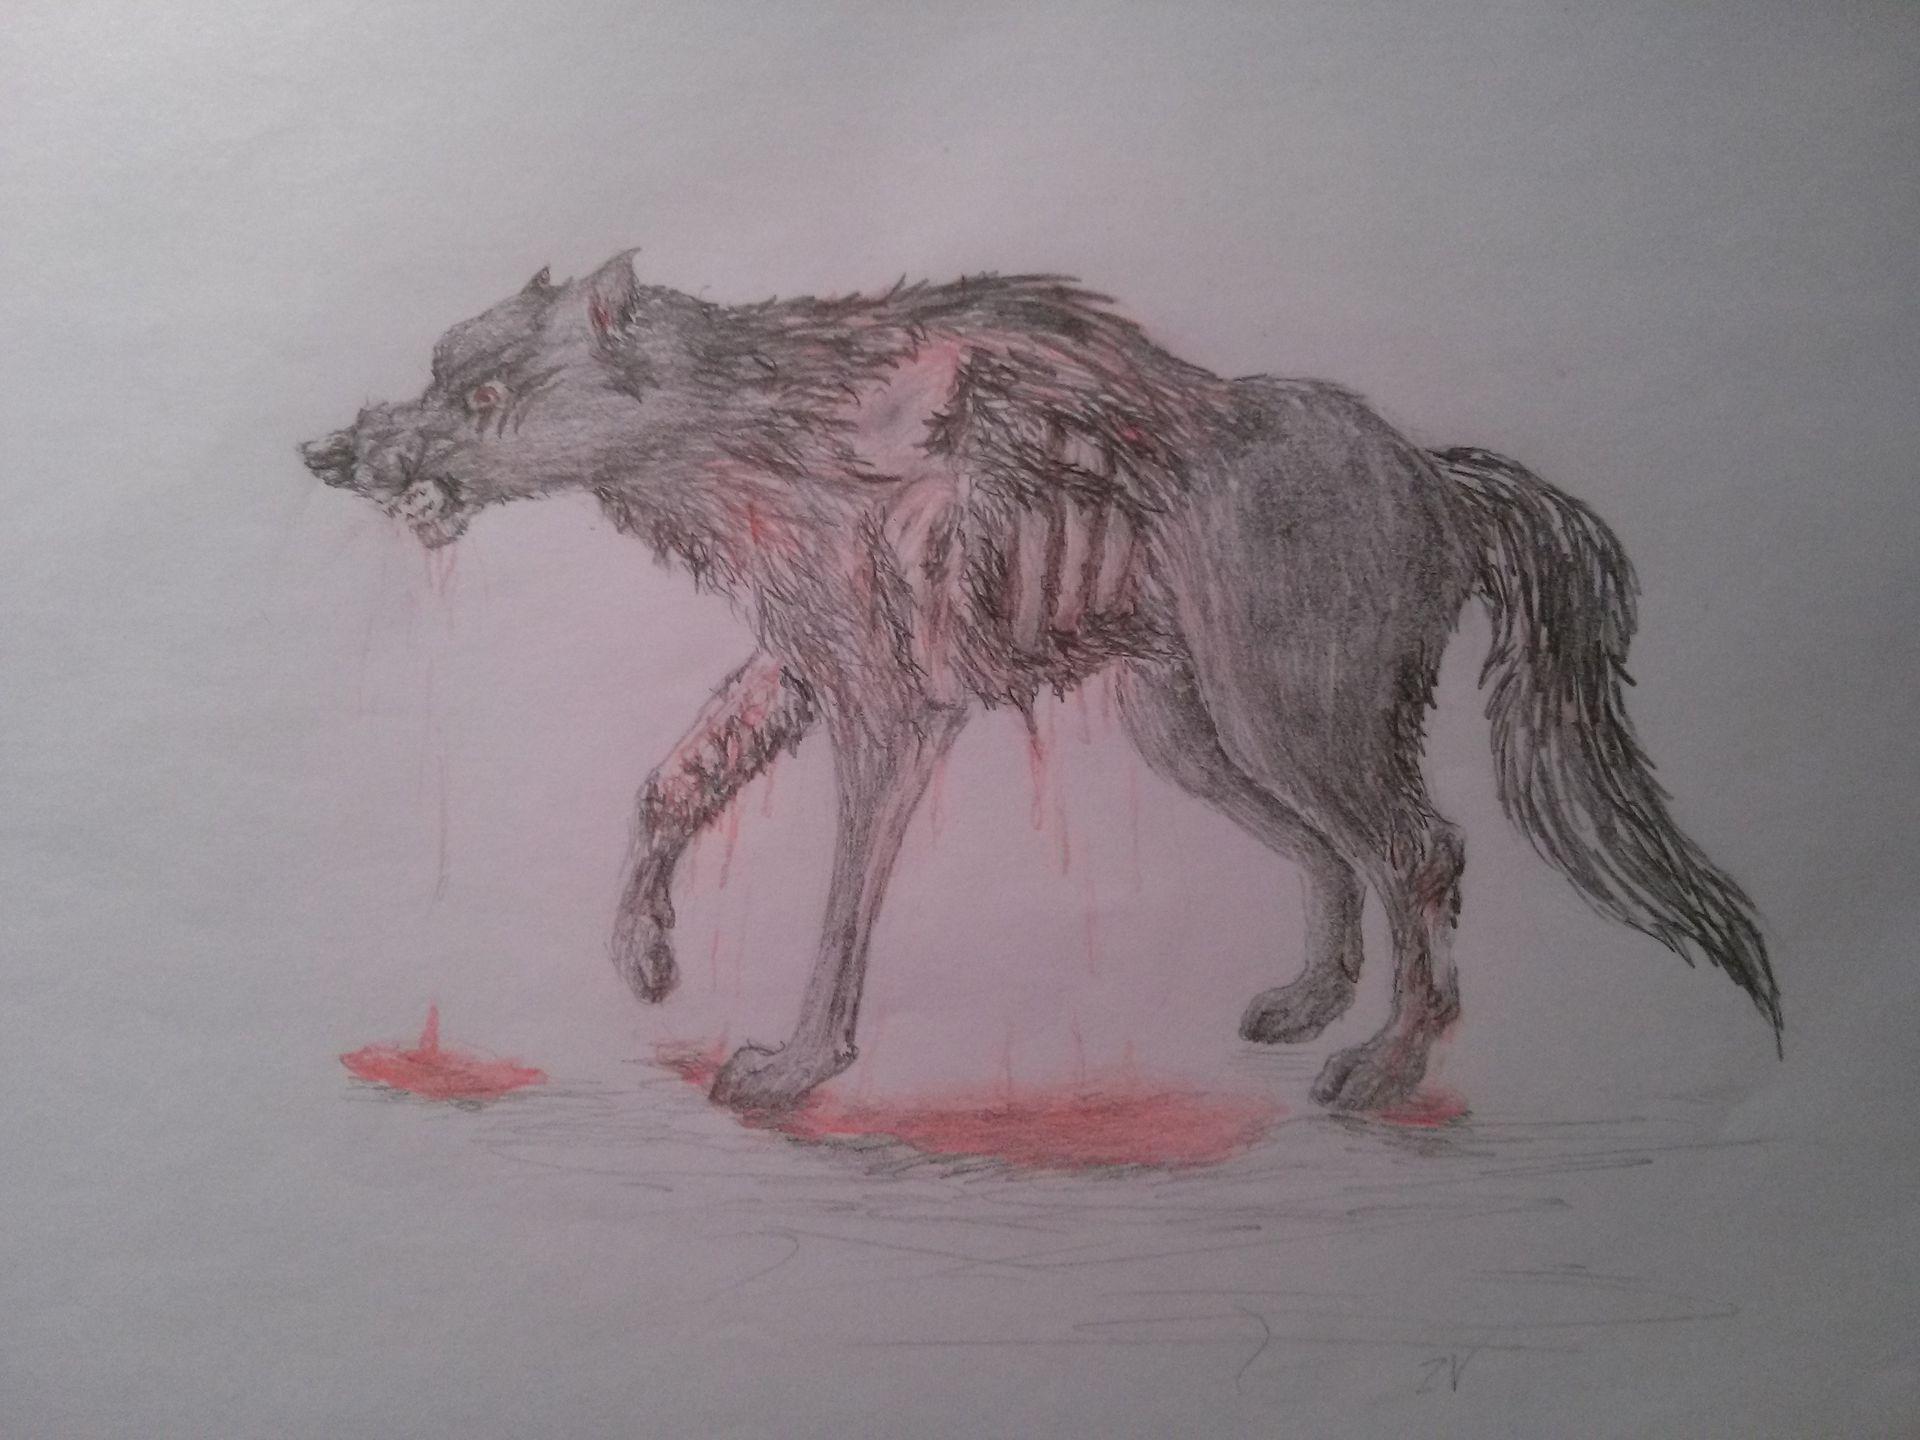 Kresby Zly Vlk Zraneny Vlk Wattpad